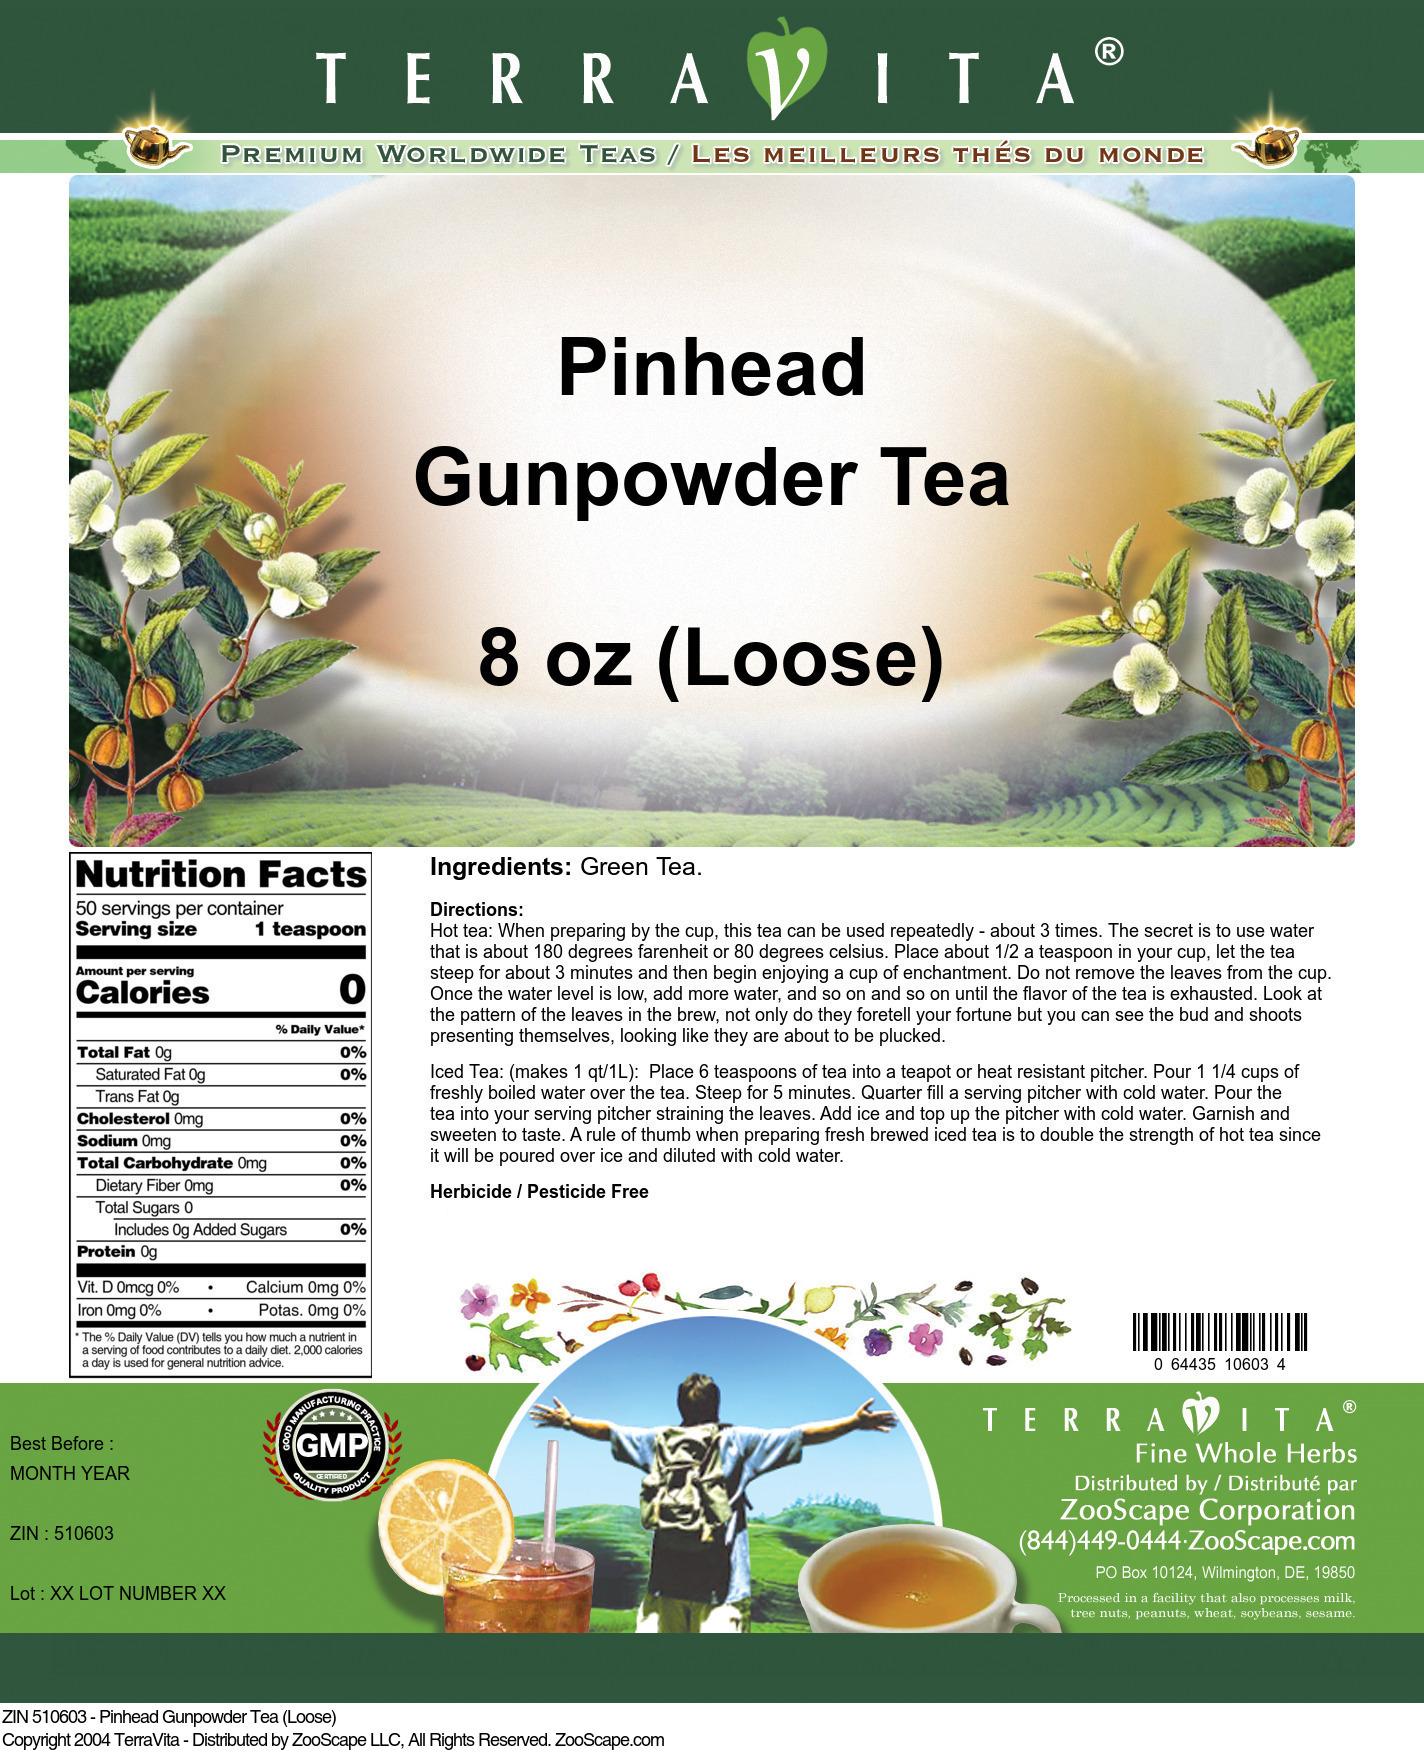 Pinhead Gunpowder Tea (Loose)